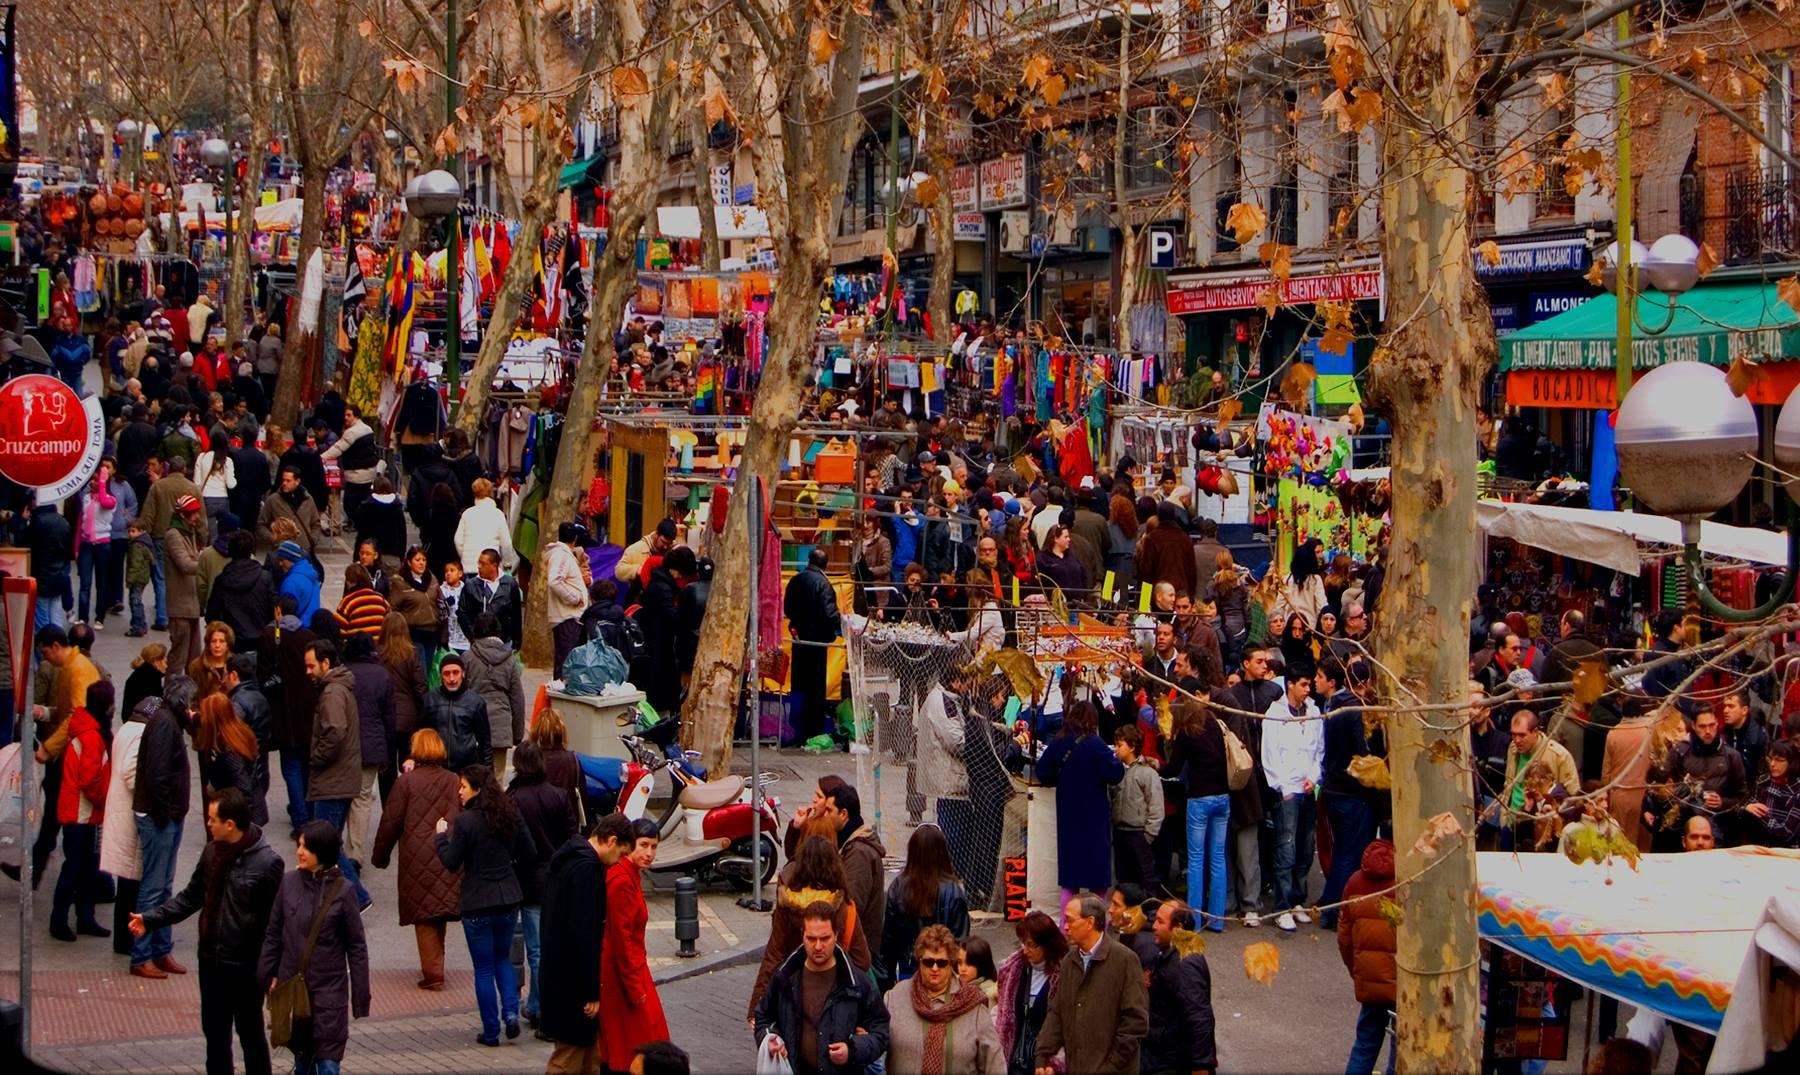 mercato del rastro madrid